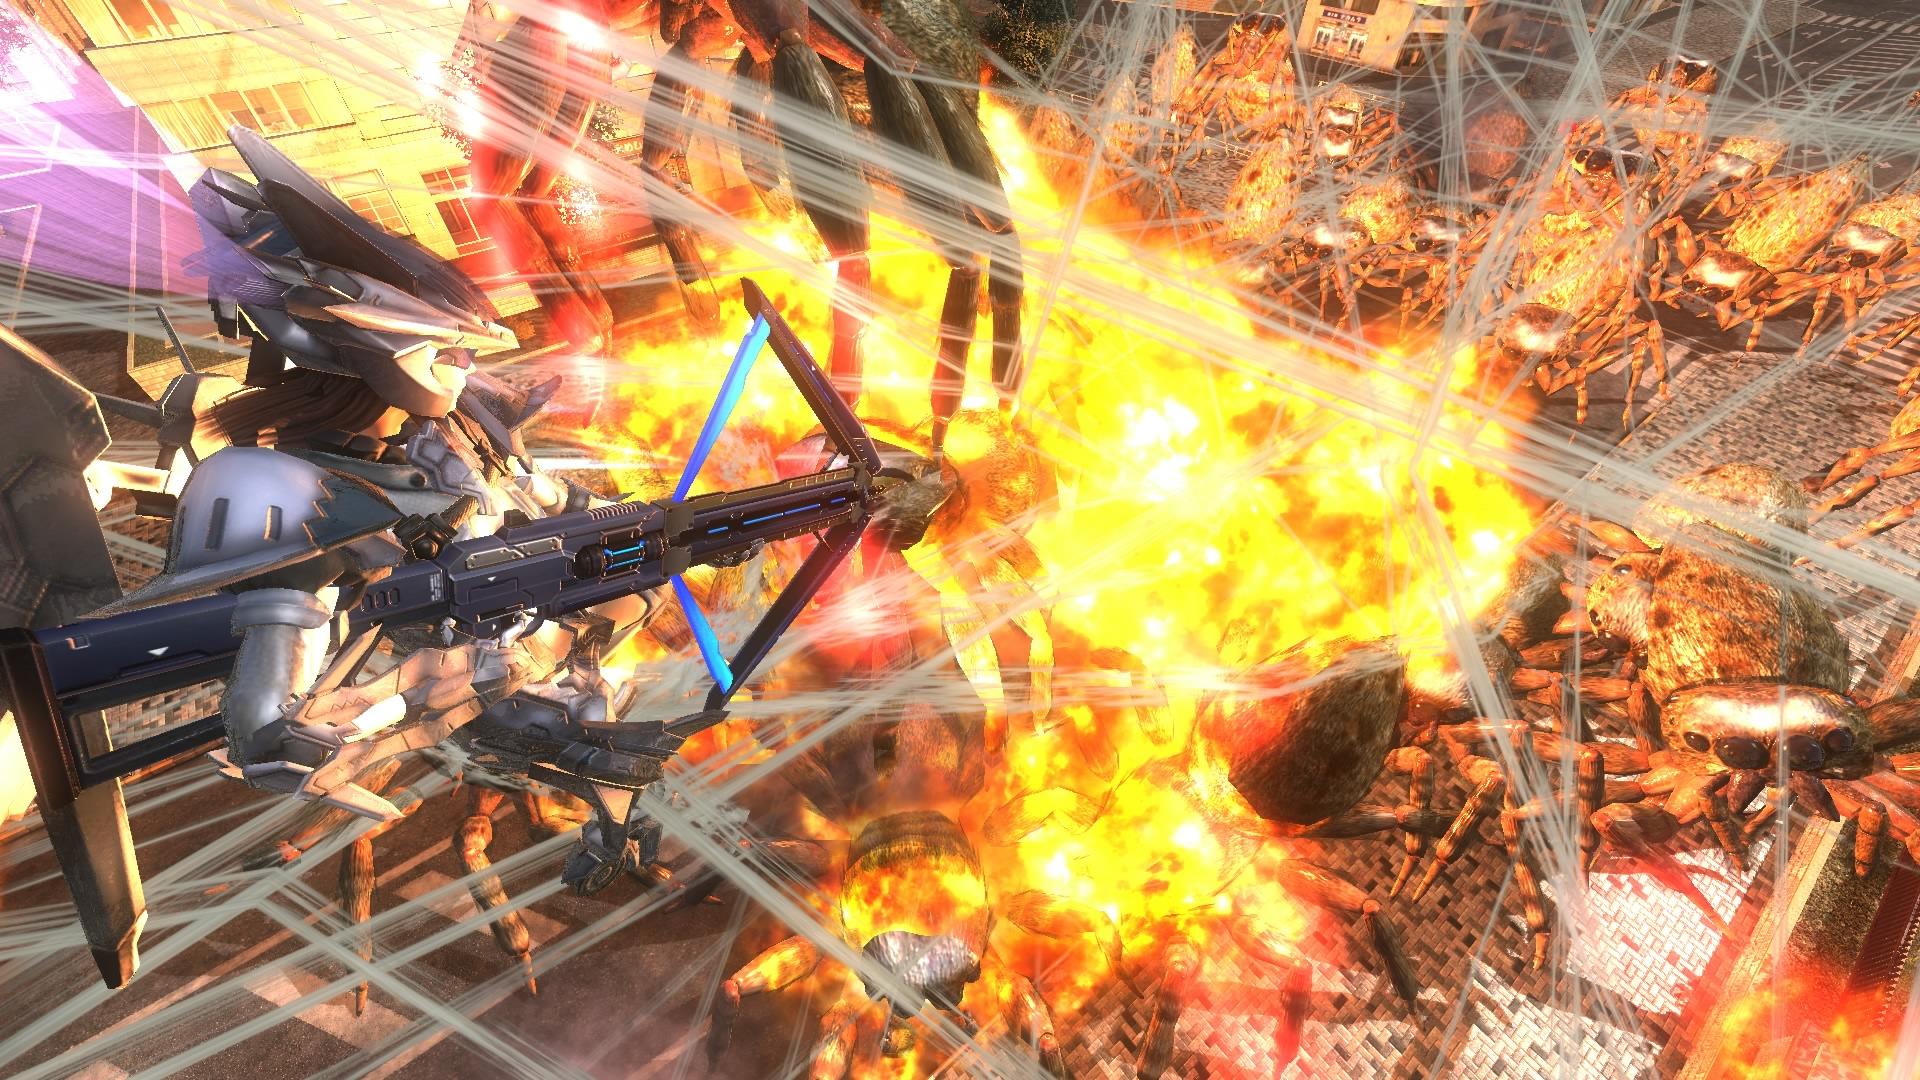 EARTH DEFENSE FORCE 4.1 The Shadow of New Despair Screenshot 3